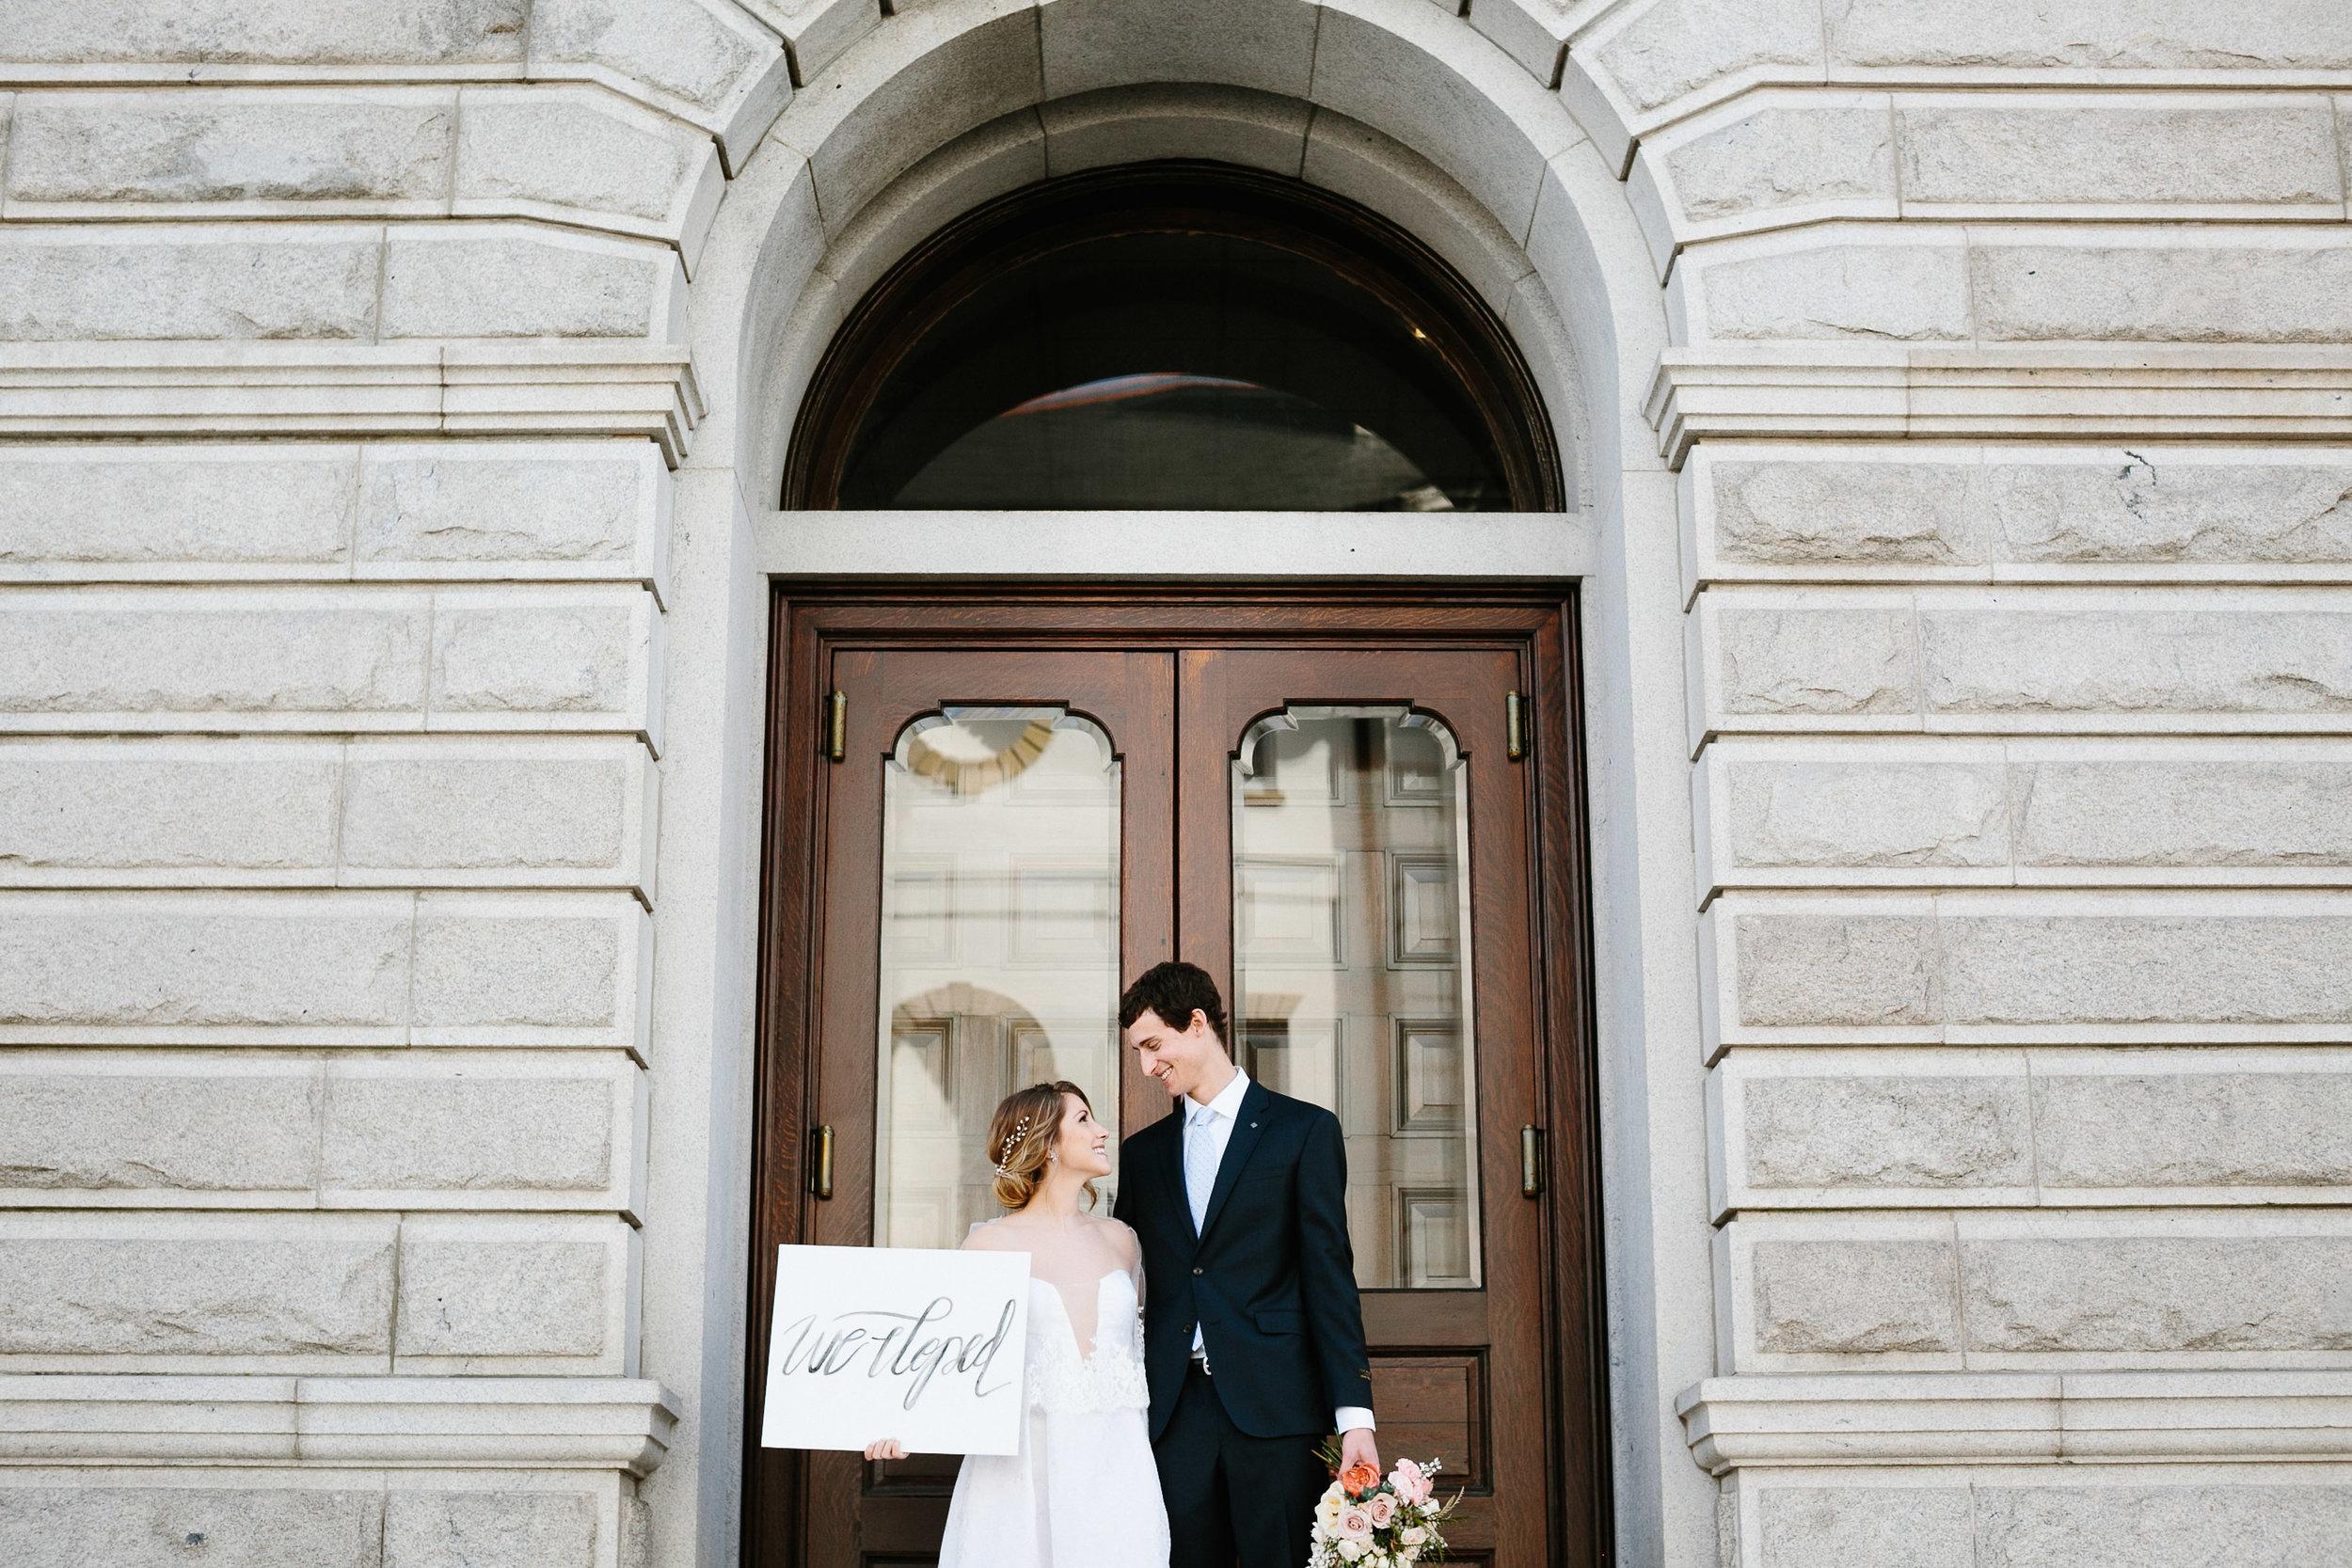 charleston-wedding-elopement-32.jpg